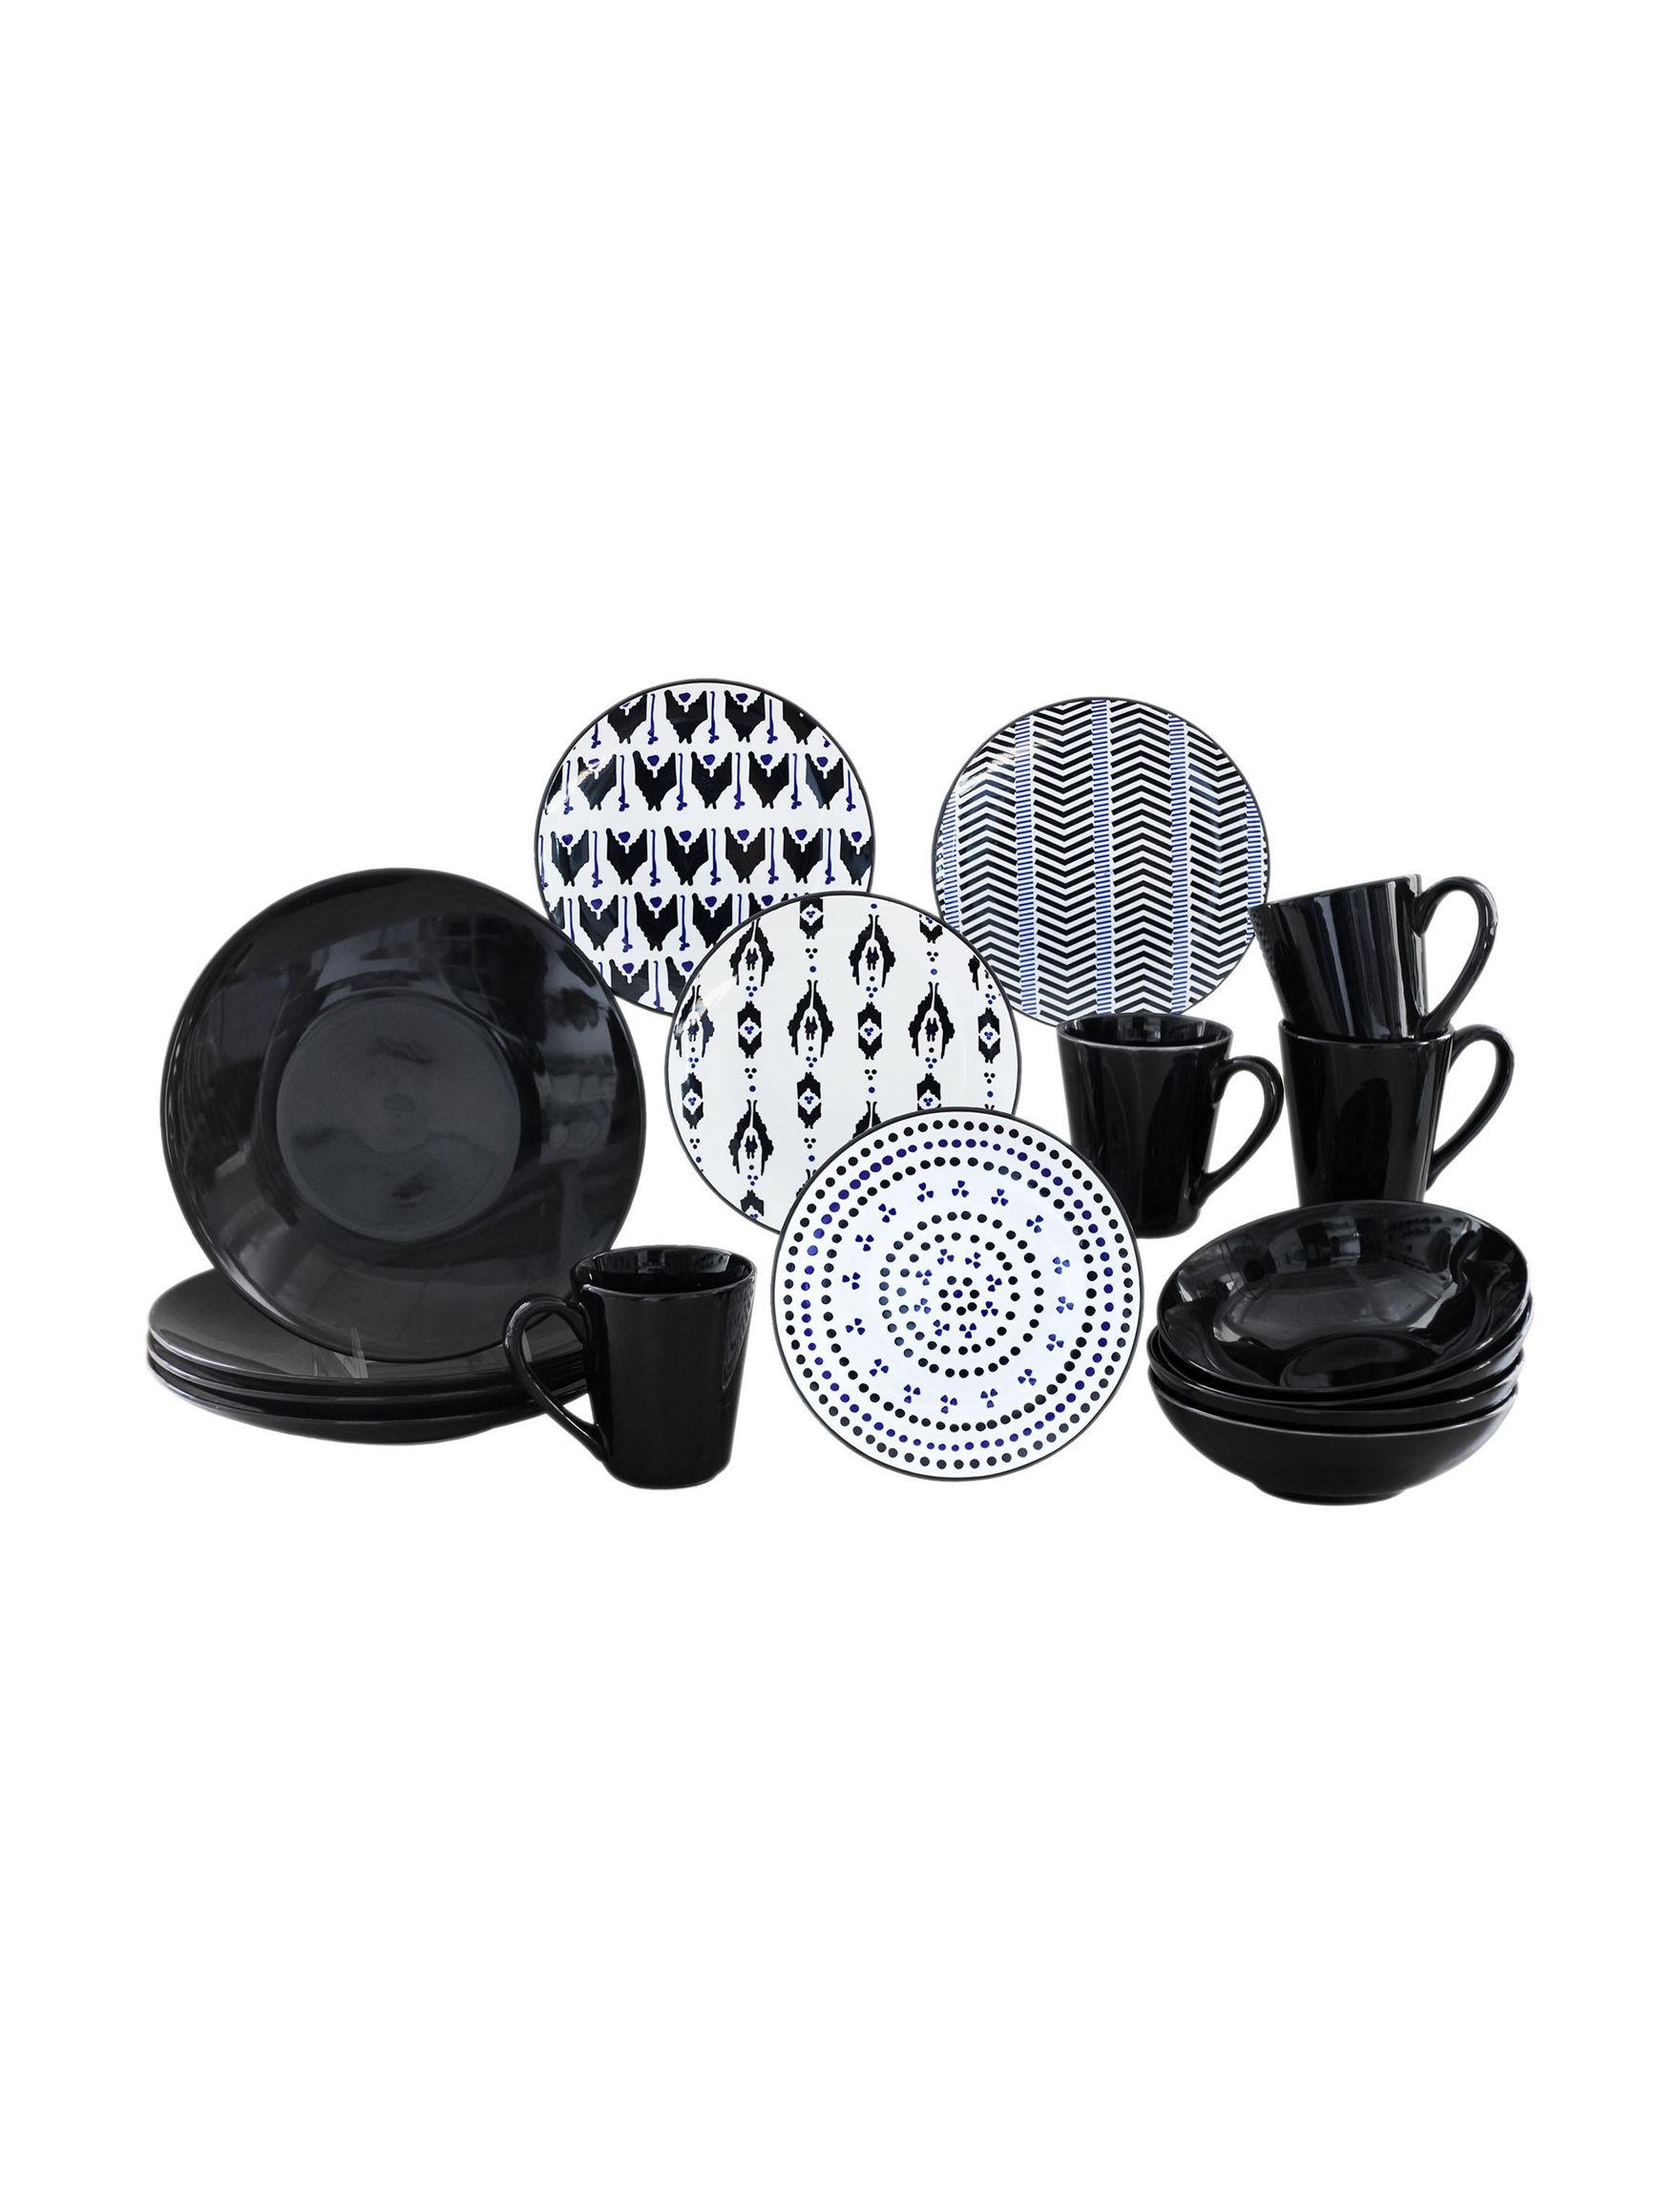 Baum Bros Imports Black / White Dinnerware Sets Dinnerware